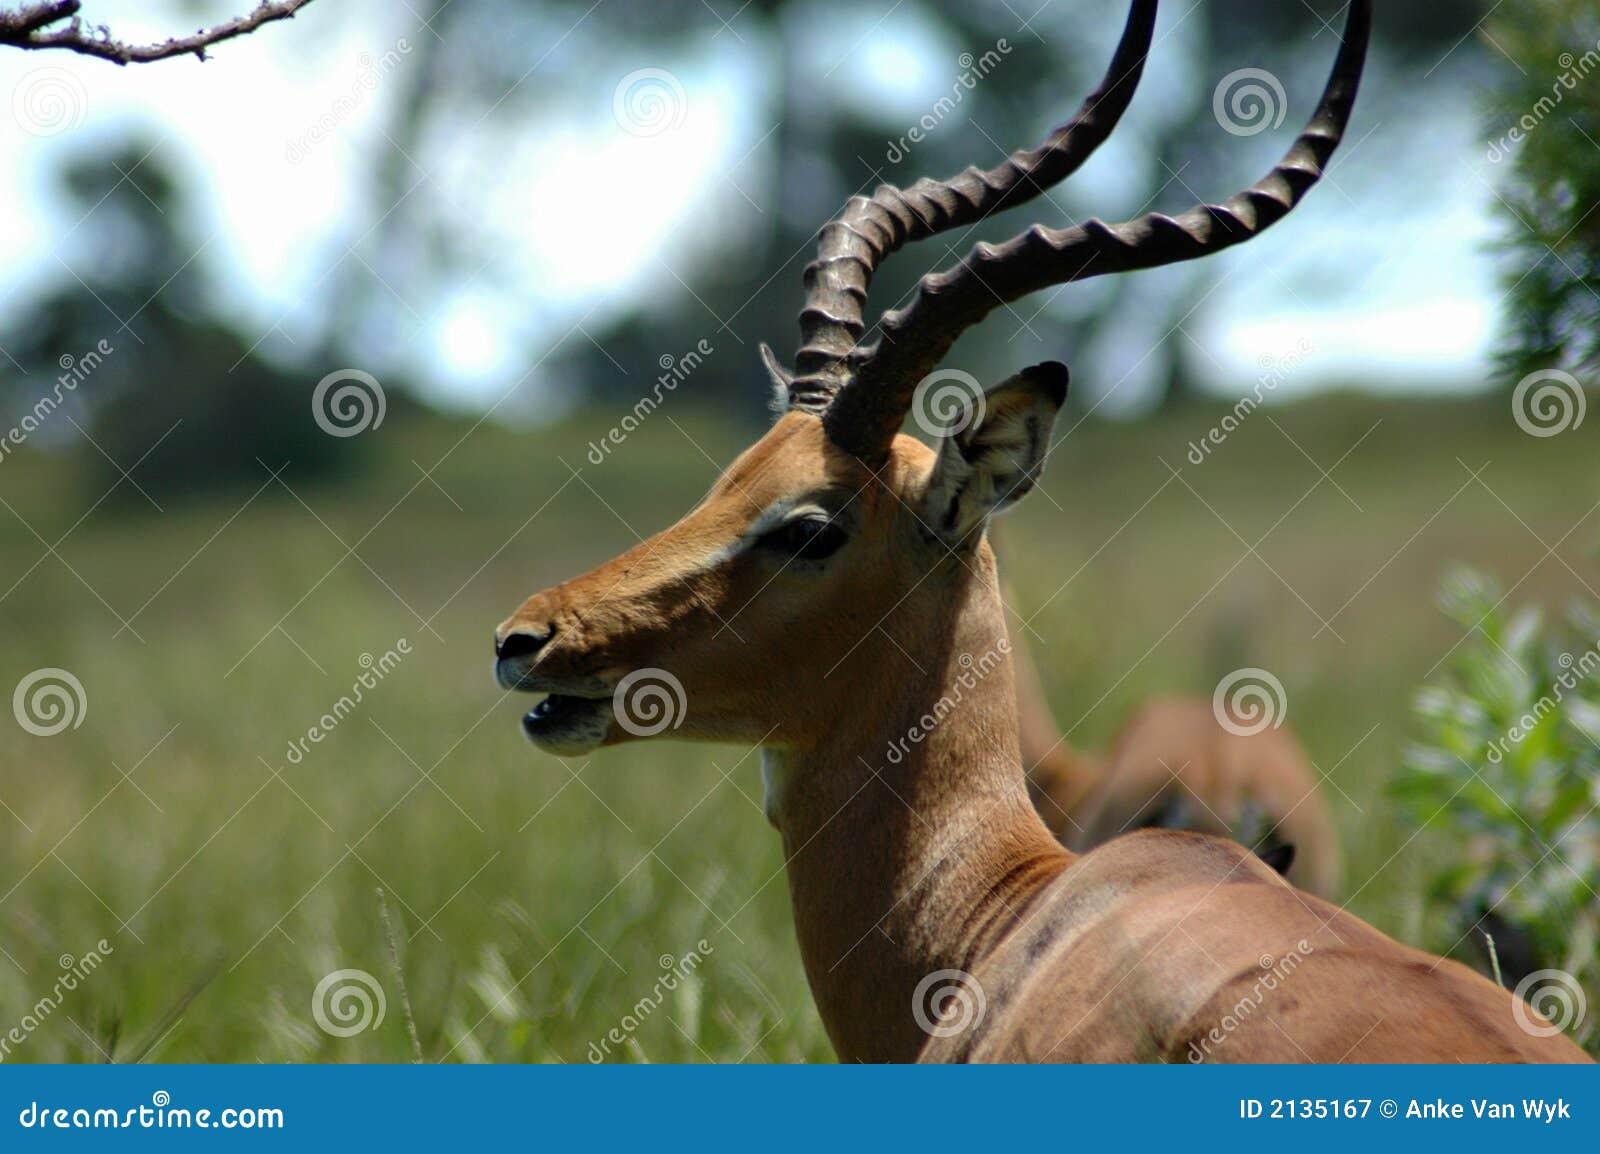 african impala antelope stock image image of gazelle. Black Bedroom Furniture Sets. Home Design Ideas